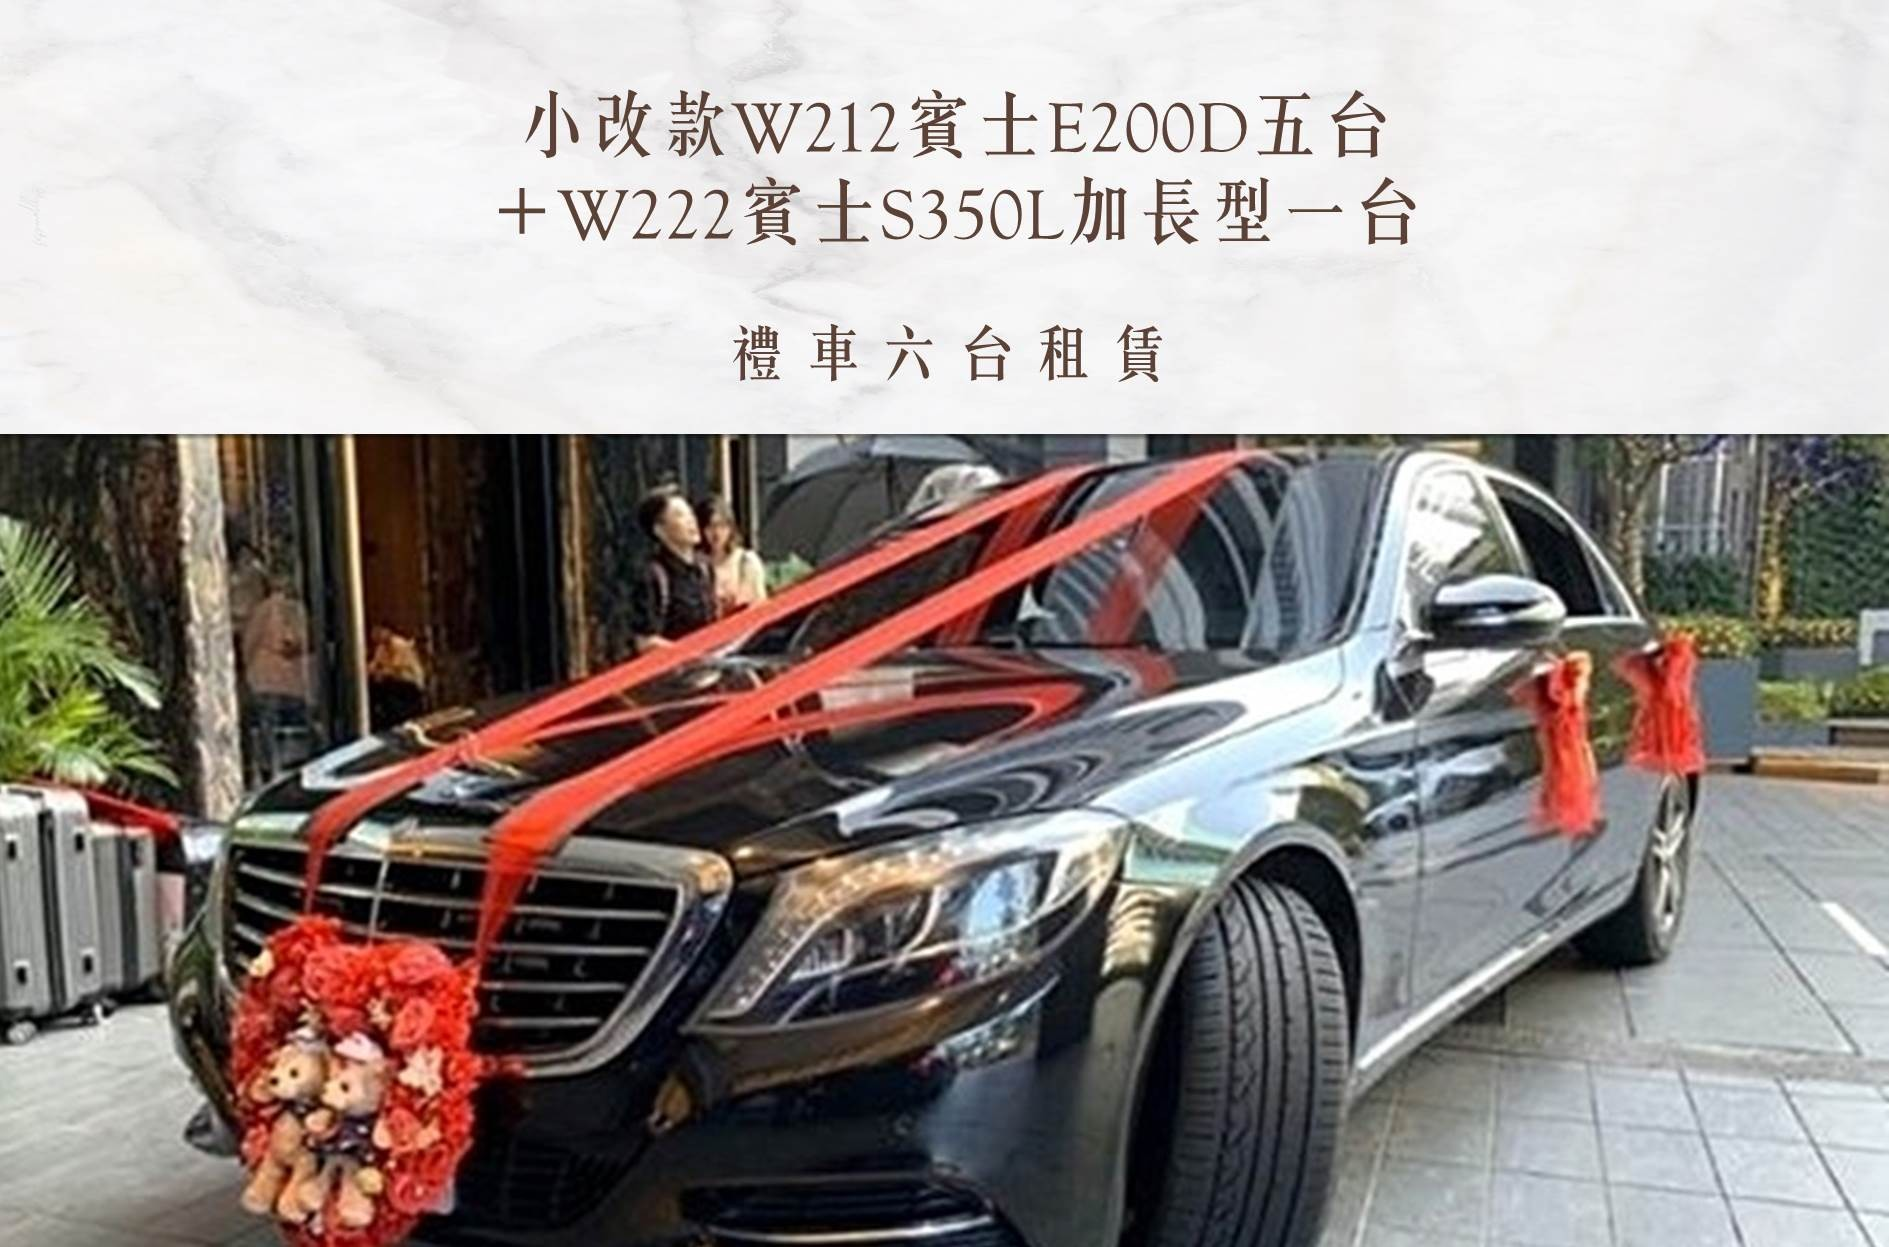 小改款W212賓士E200D五台+W222賓士S350L加長型一台